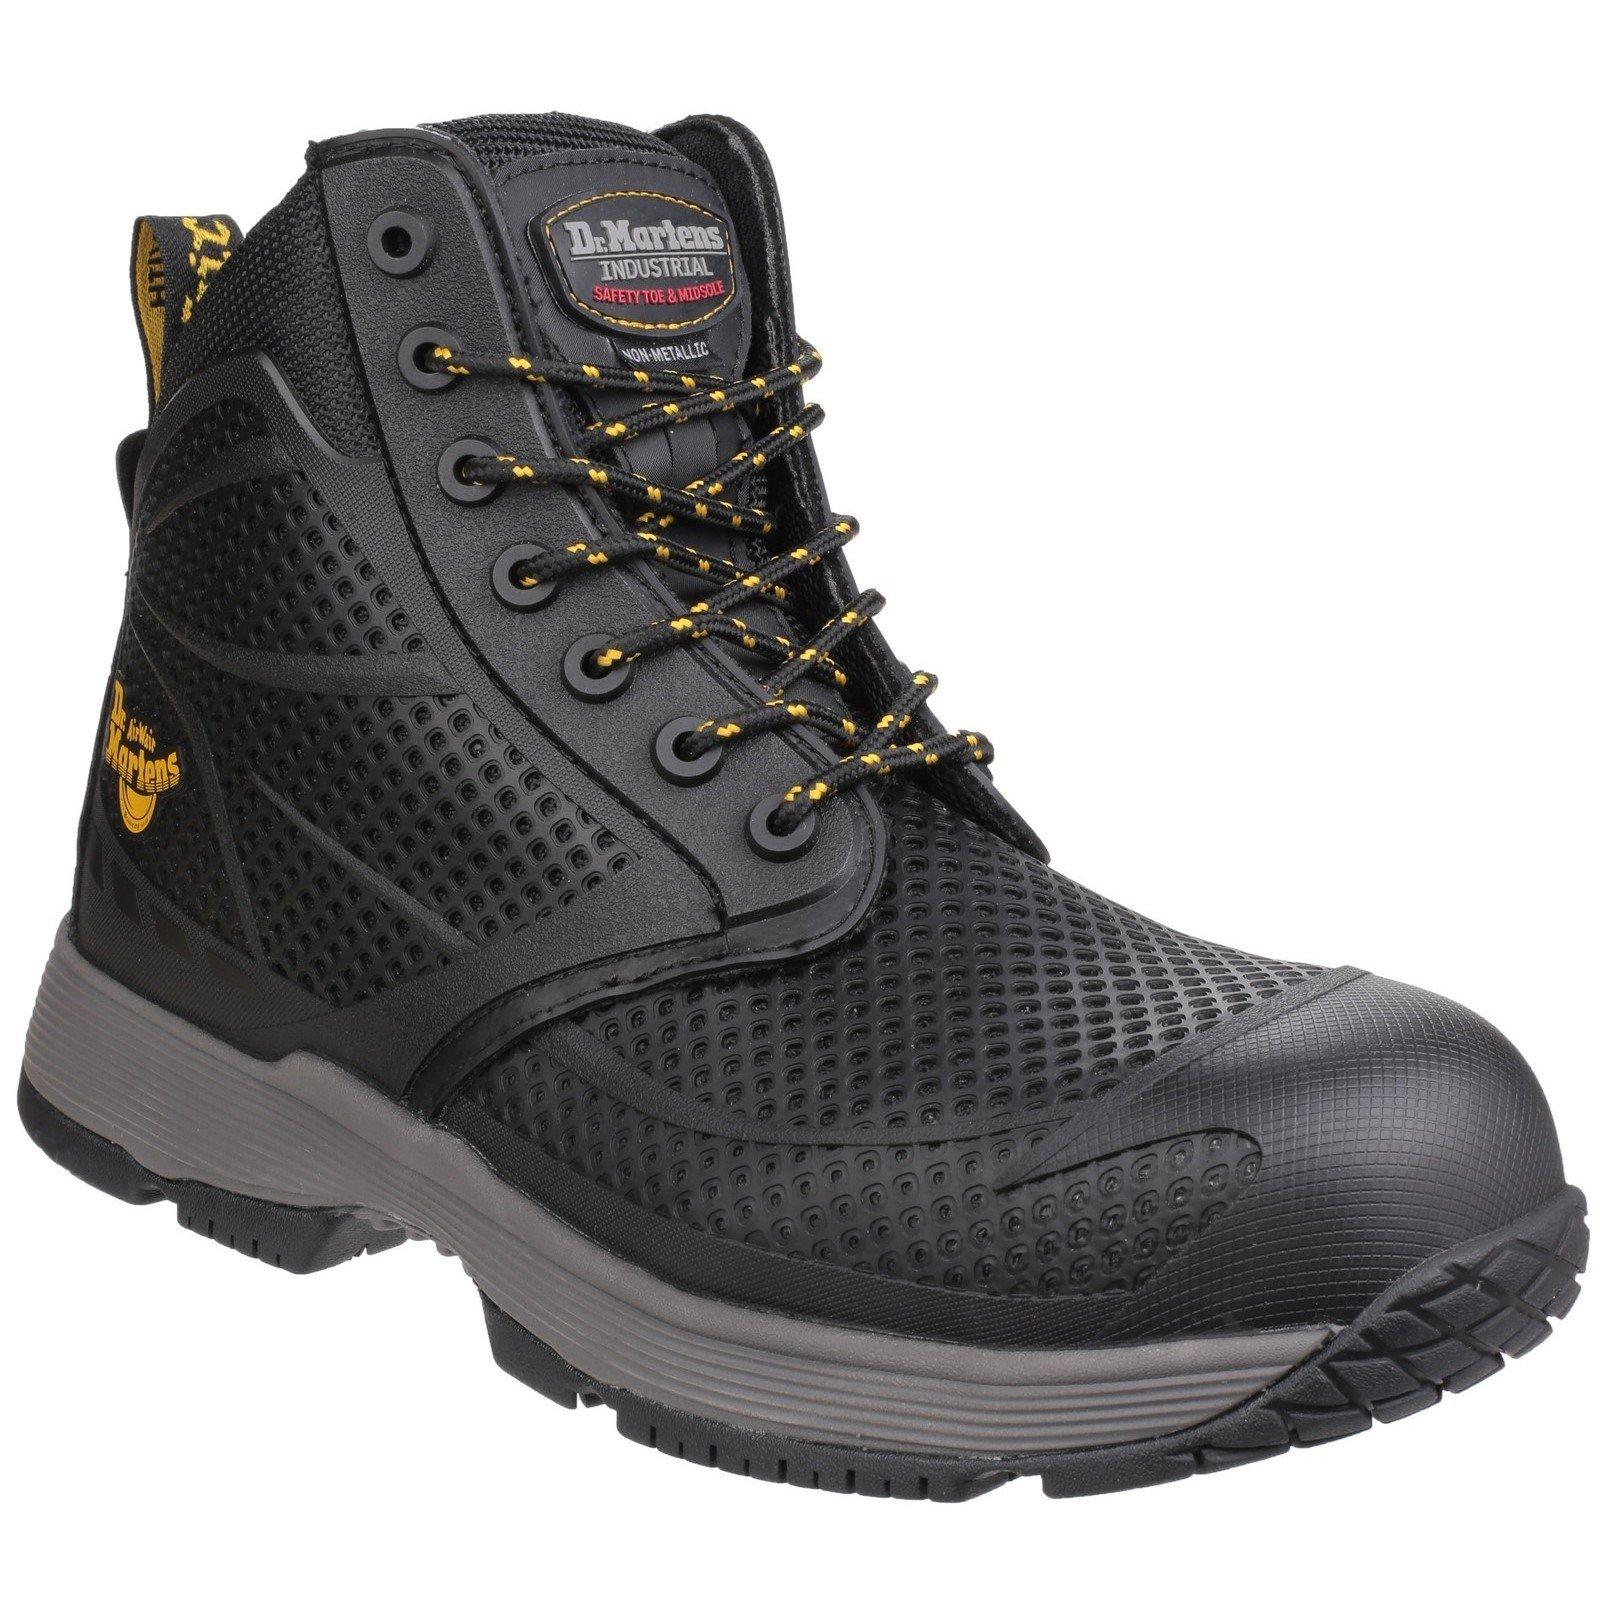 Dr Martens Unisex Calamus Lace up Safety Boot Black 24535-40574 - Black 7